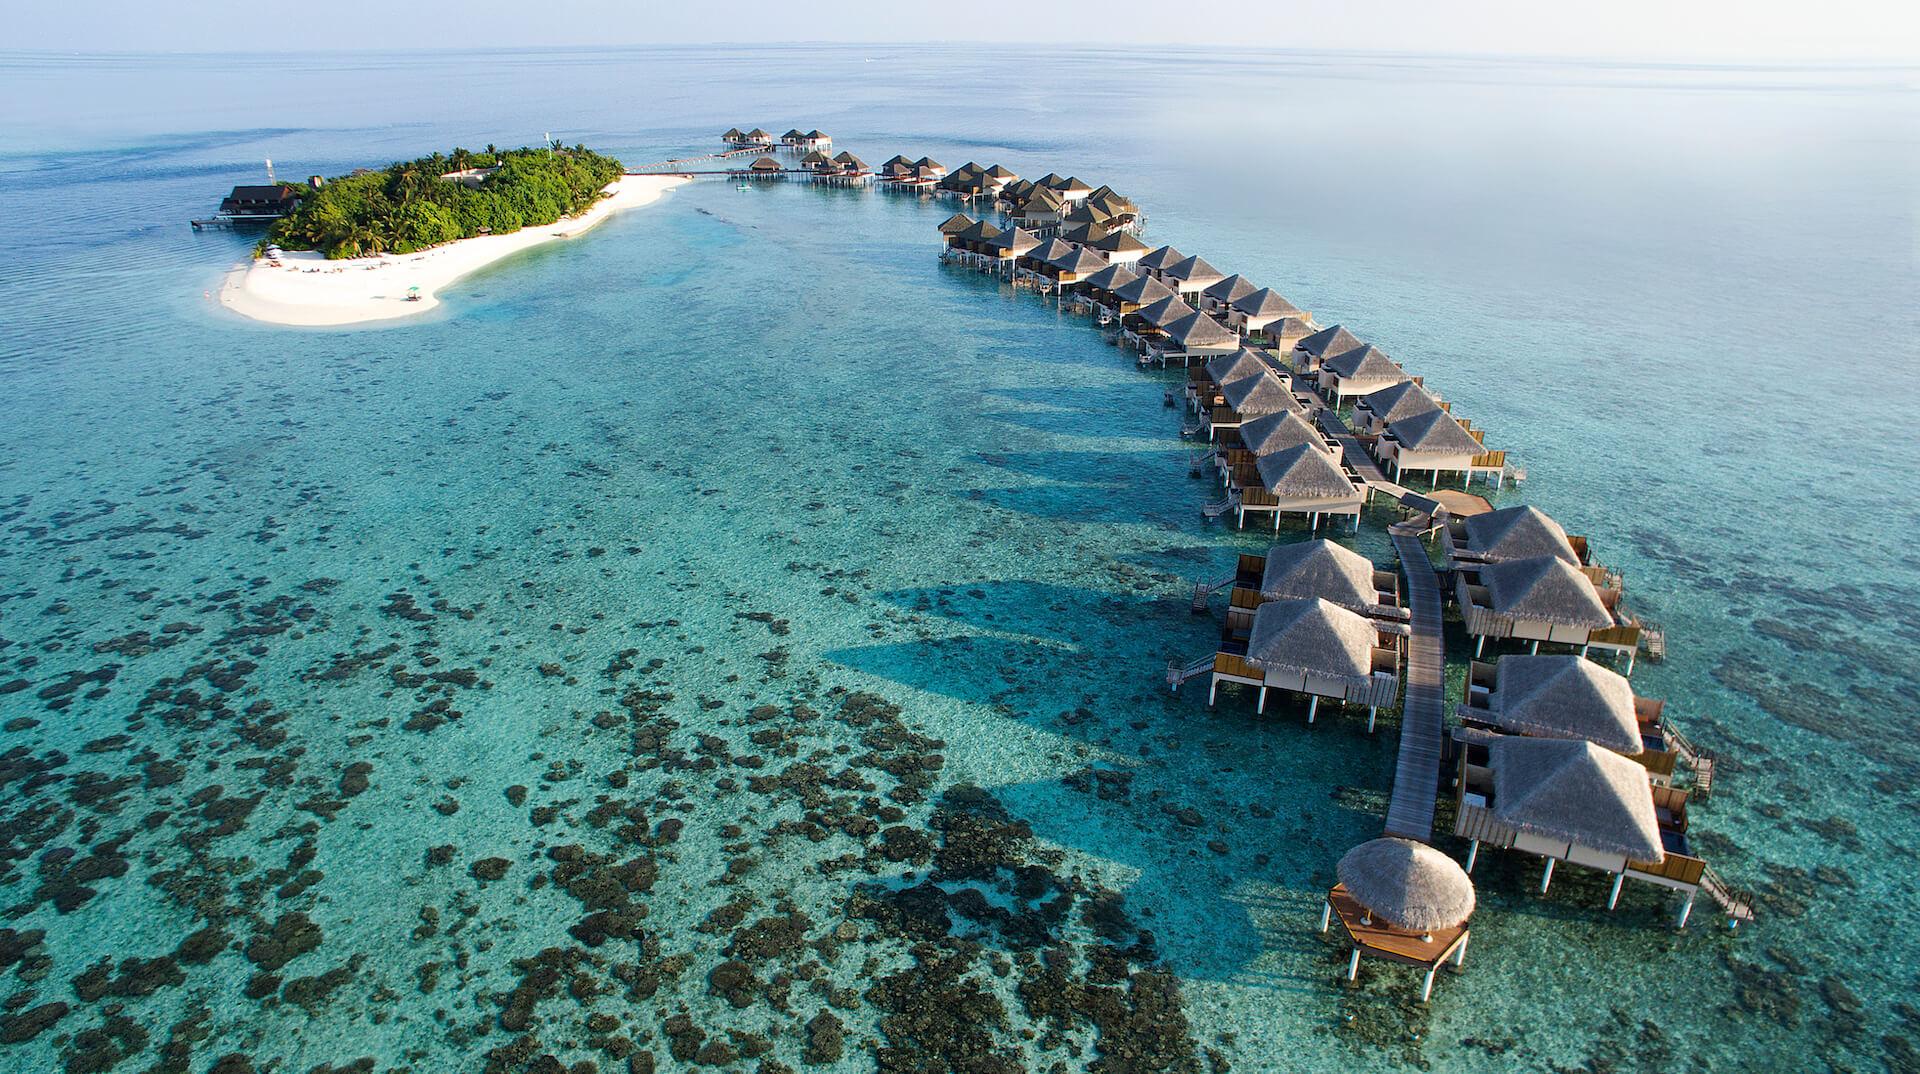 Extreme Water Sports, Maldives Style